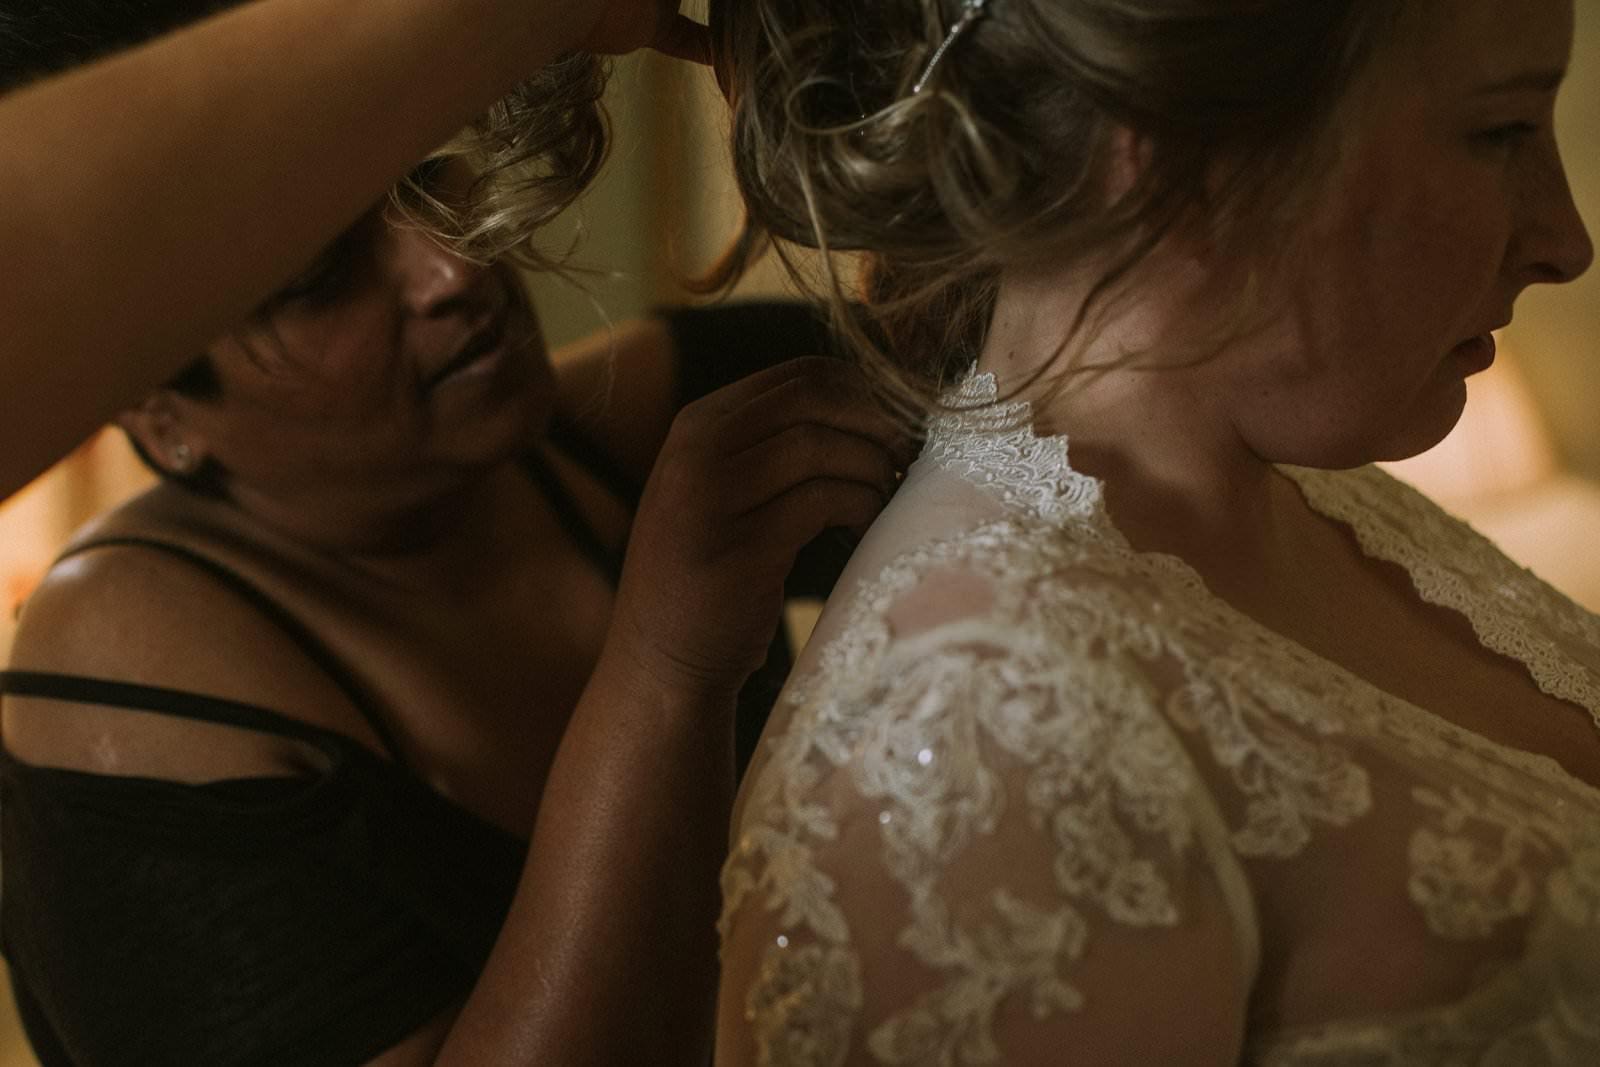 abbotsford-house-wedding-photographer-22